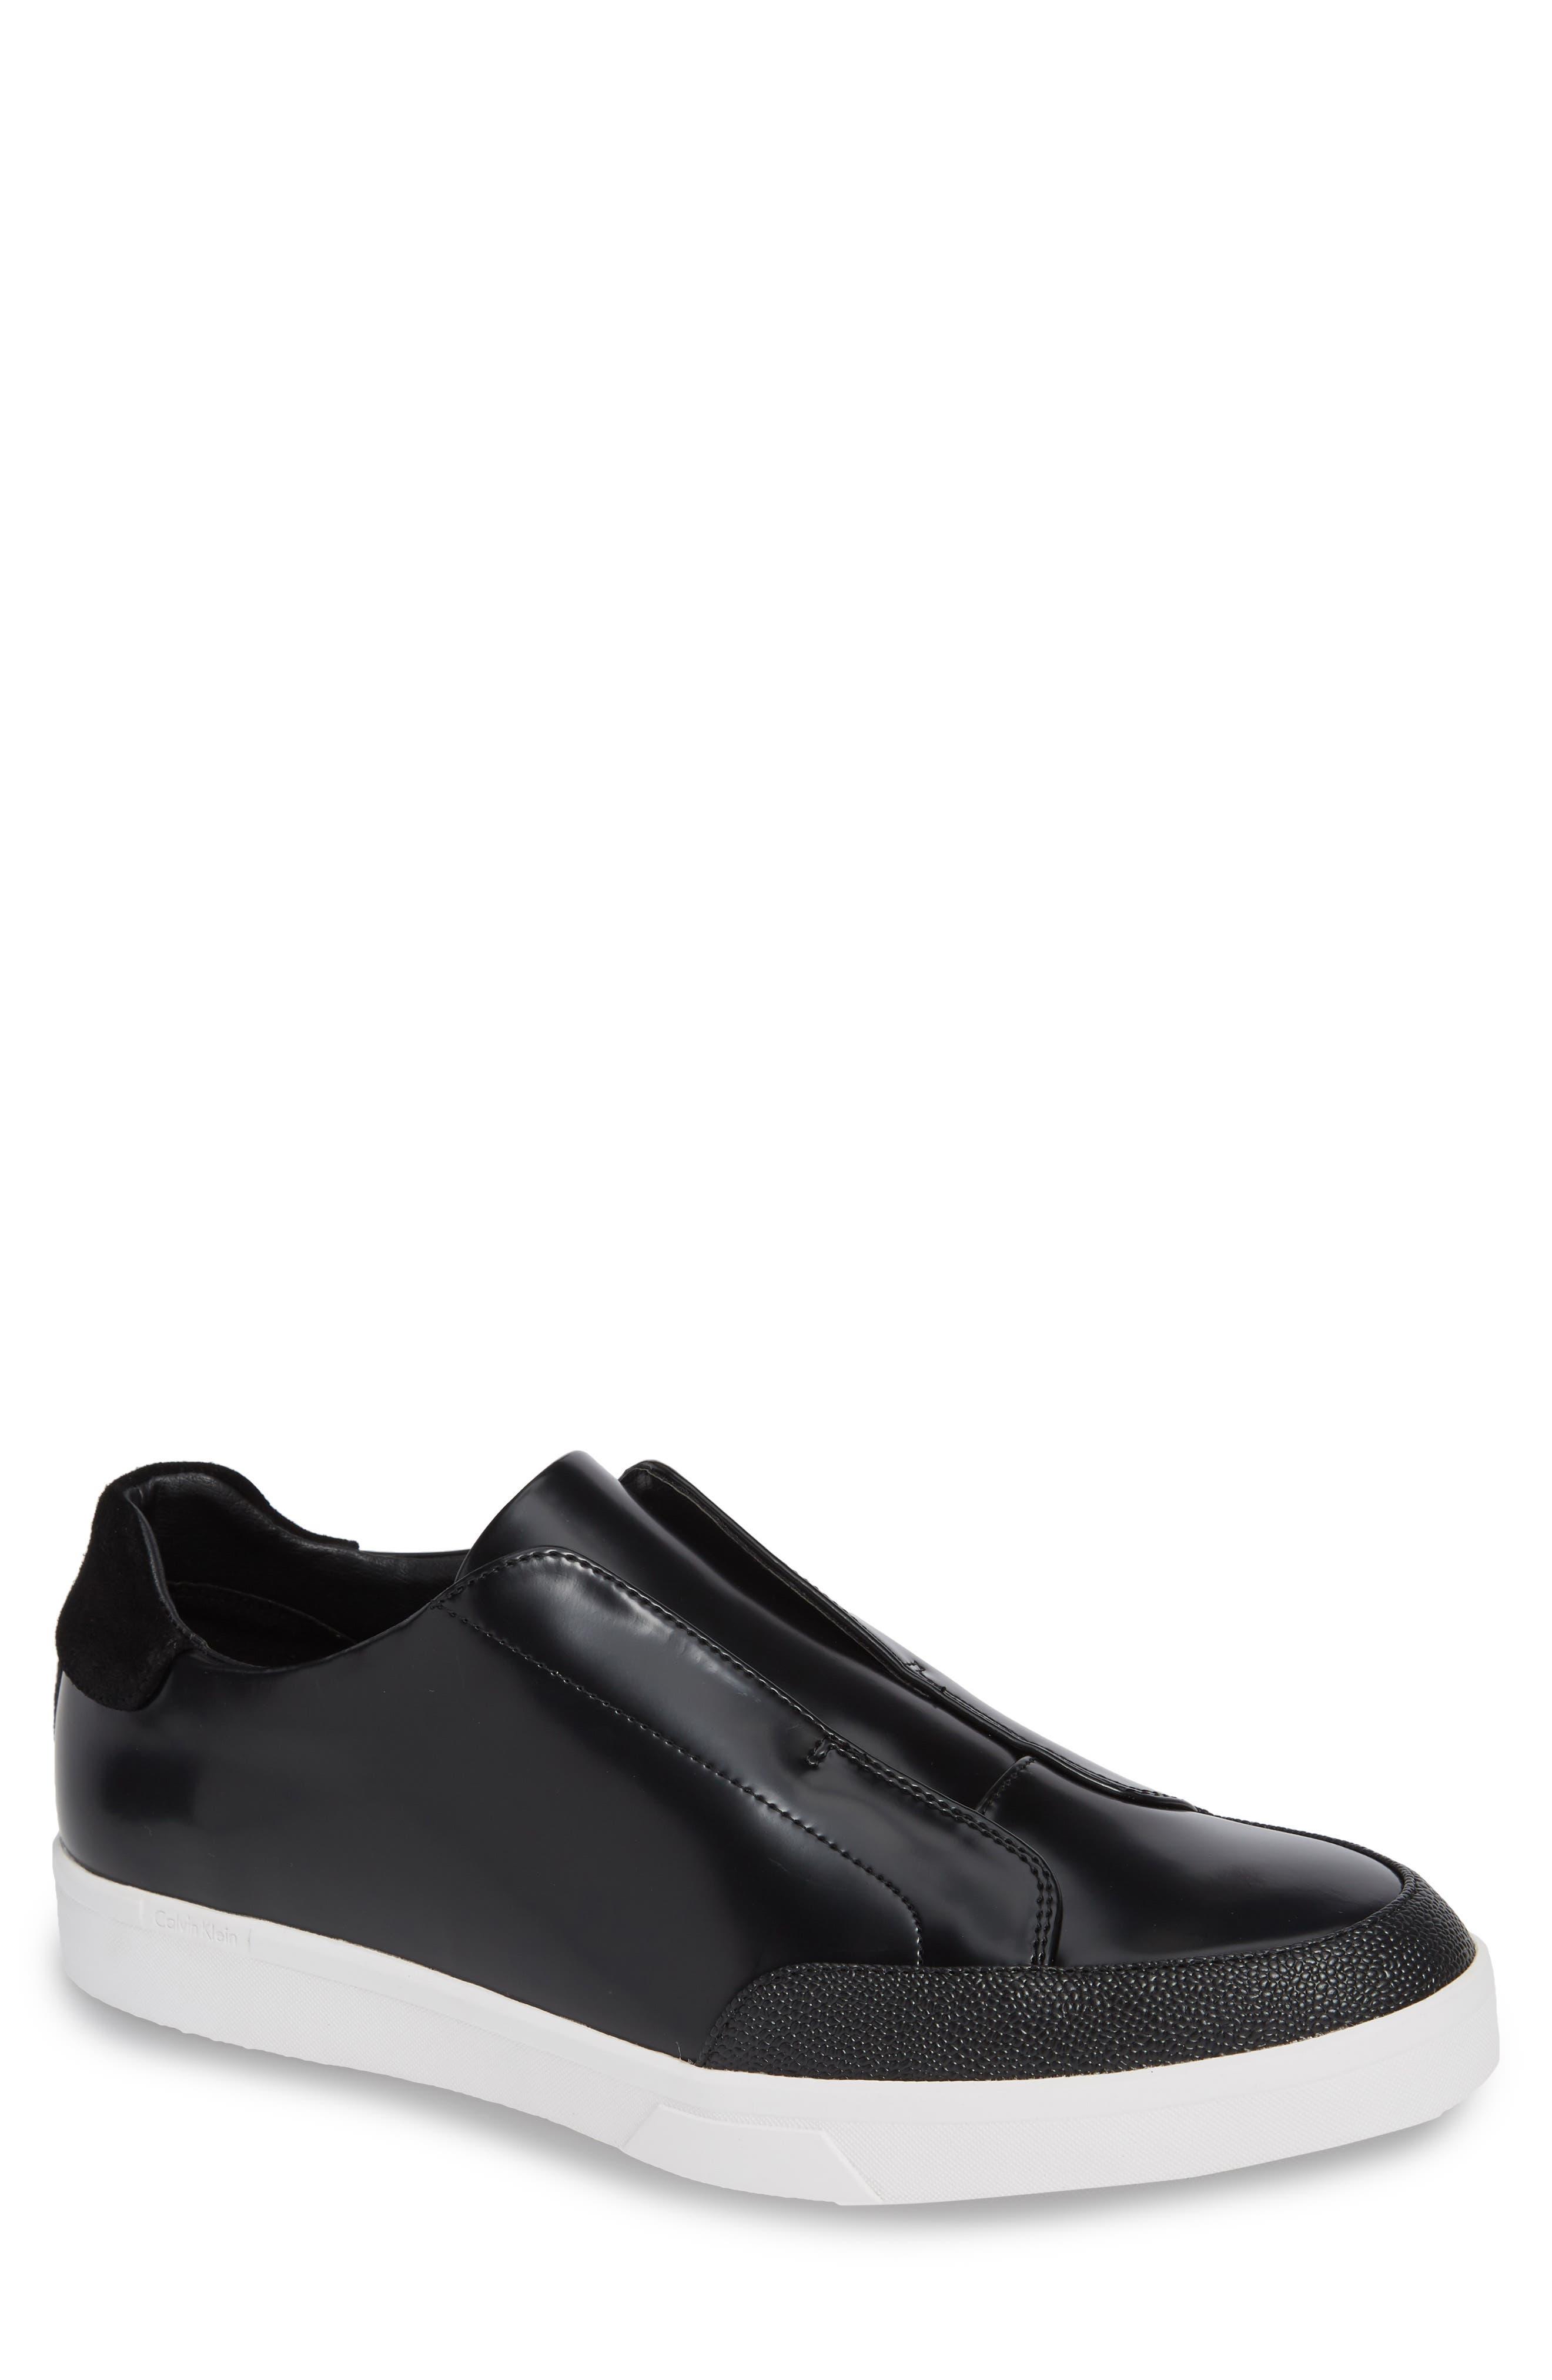 Immanuel Slip-On Sneaker,                             Main thumbnail 1, color,                             BLACK LEATHER